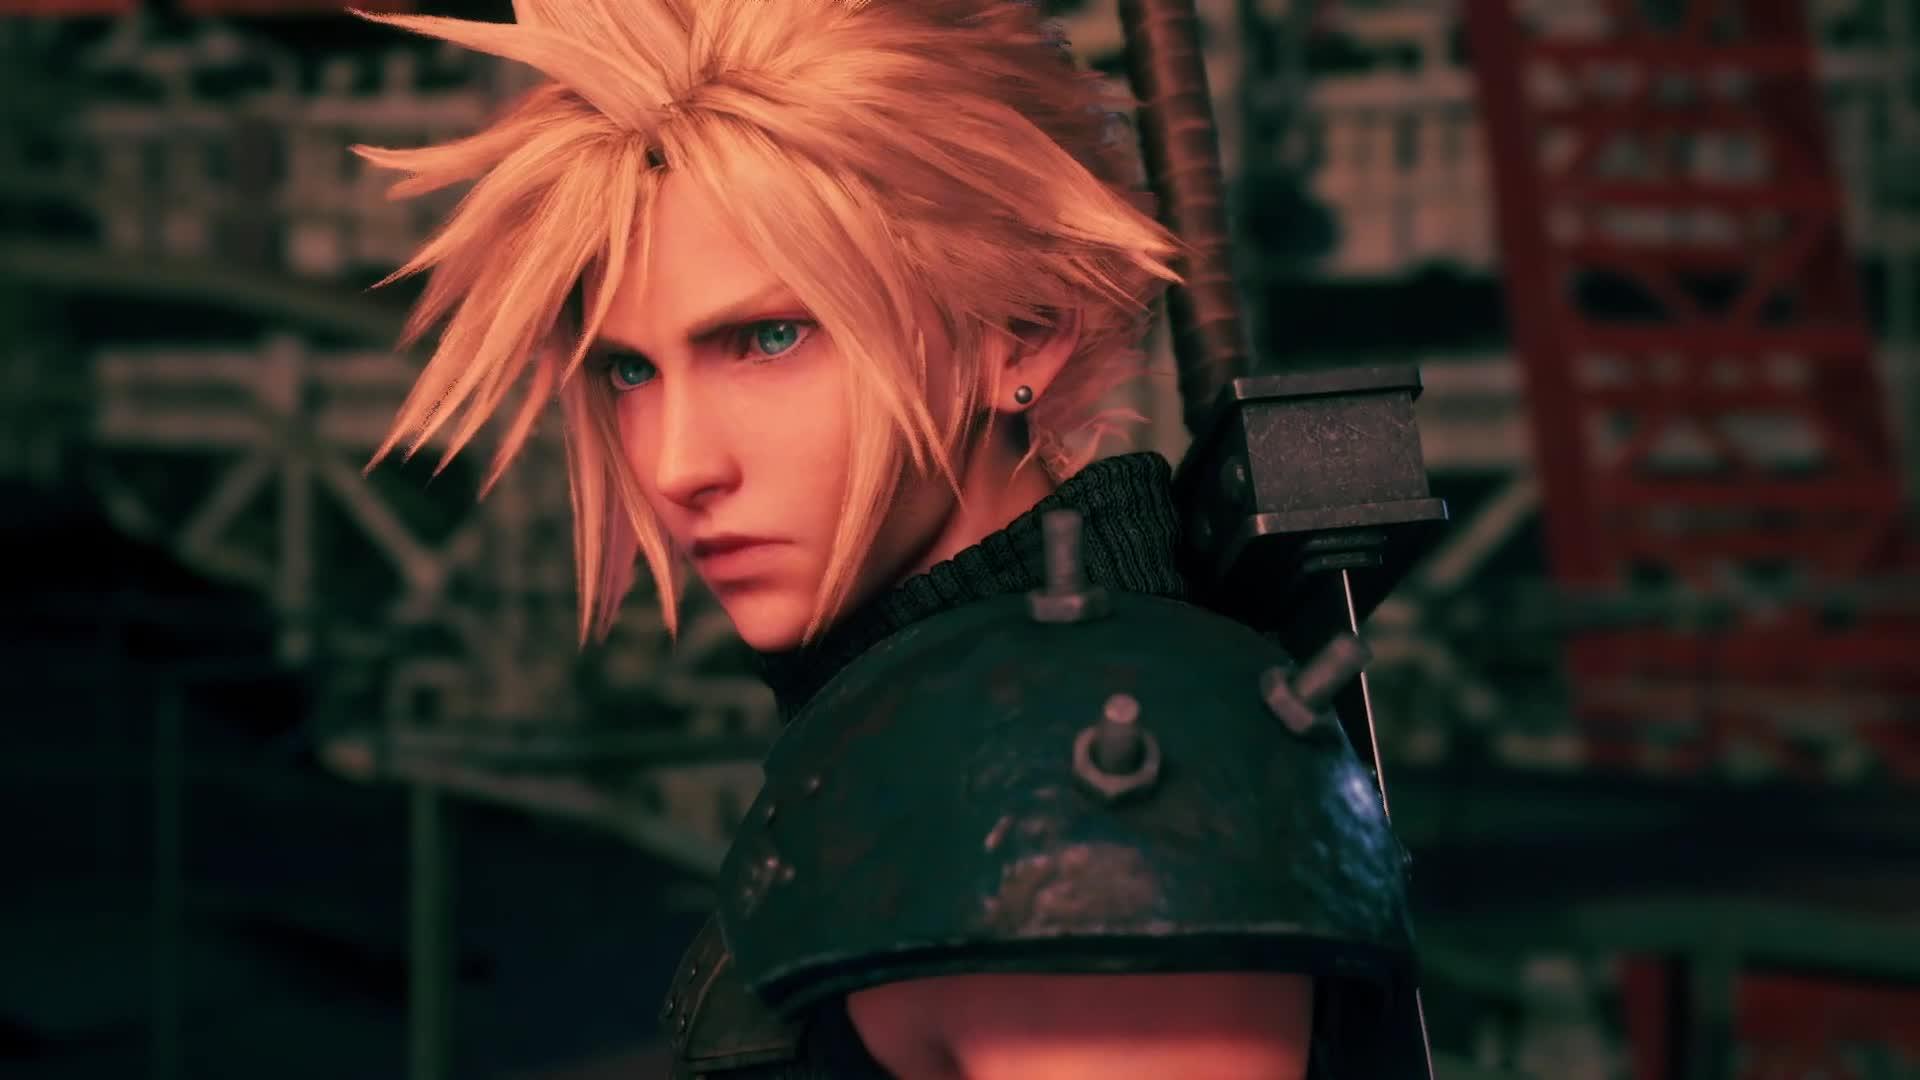 Trailer, Rollenspiel, Square Enix, Final Fantasy, TGS, final fantasy 7, Final Fantasy VII, Final Fantasy VII Remake, TGS 2019